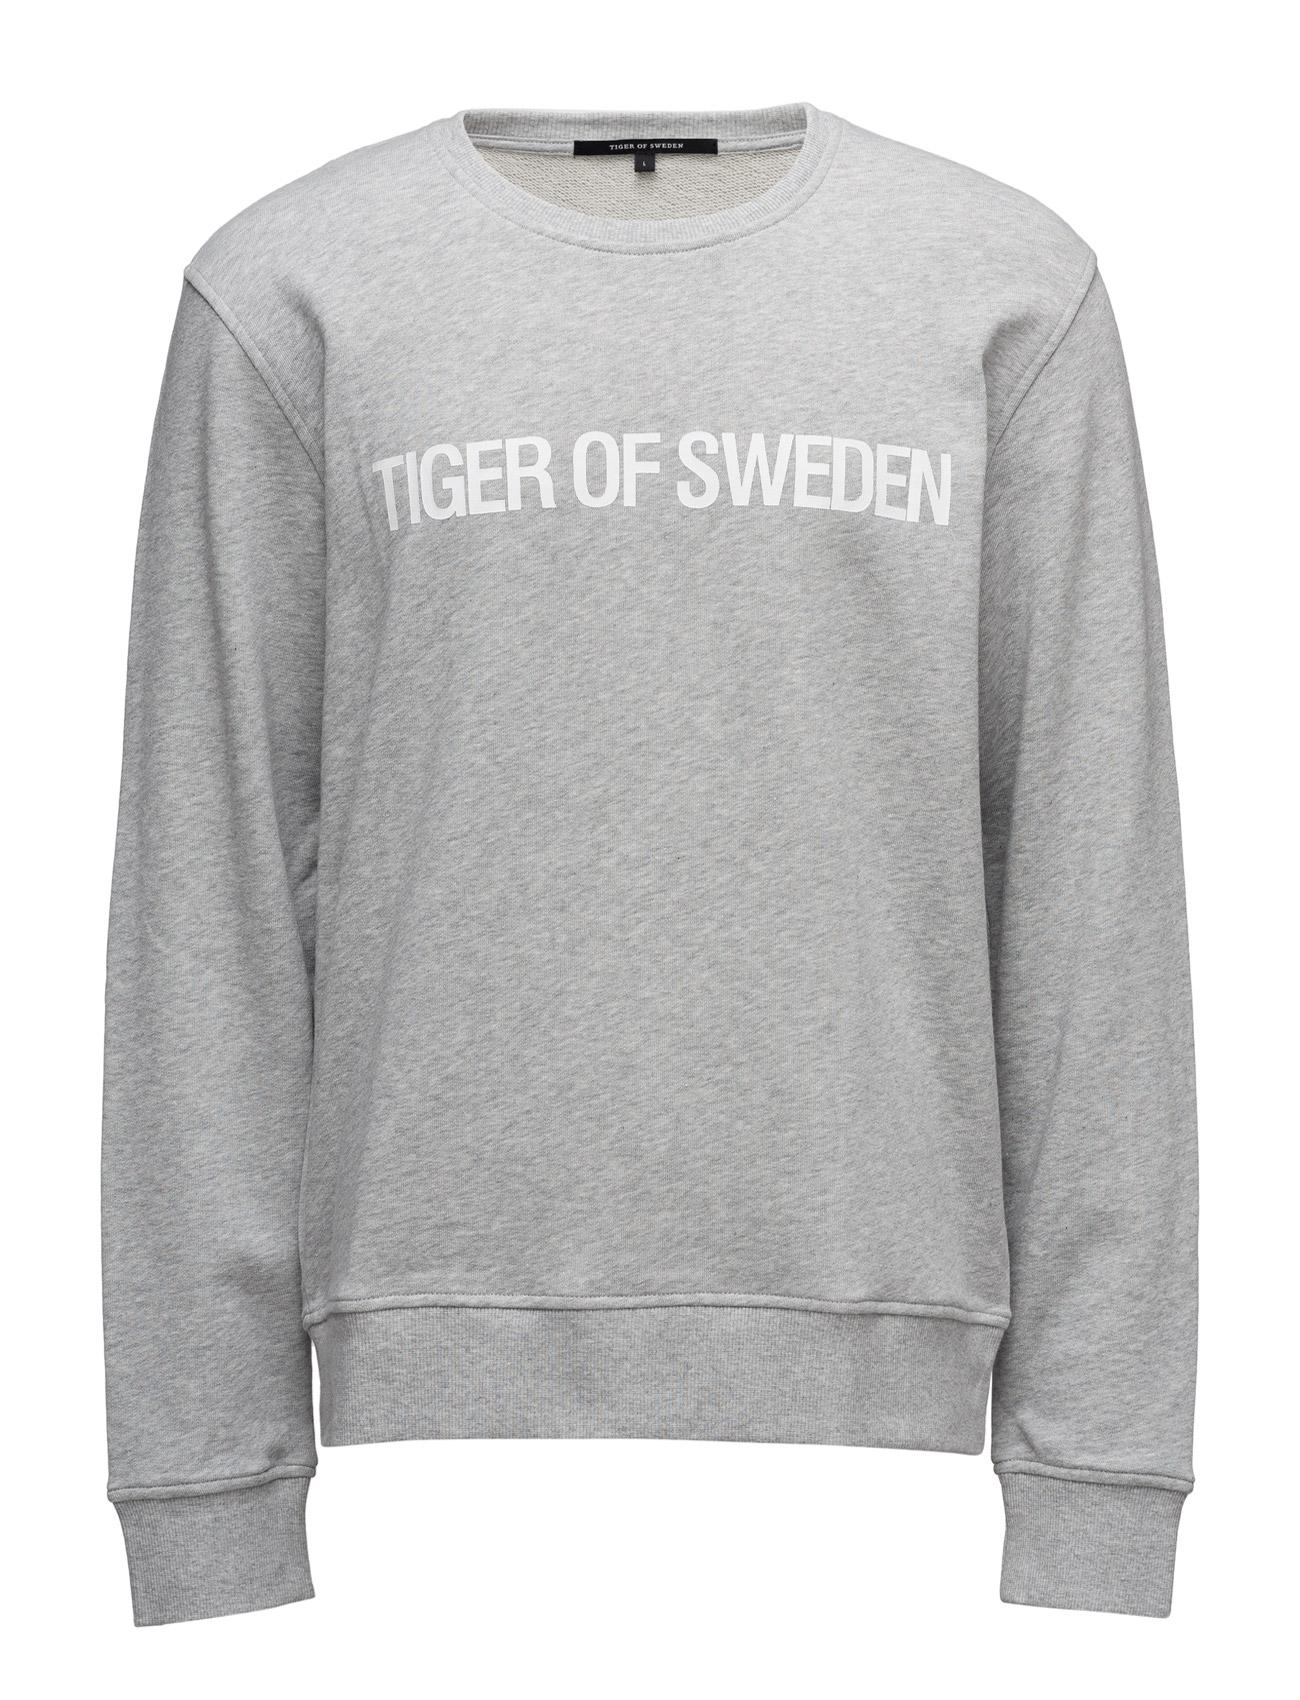 Strattford Tiger of Sweden Sweats